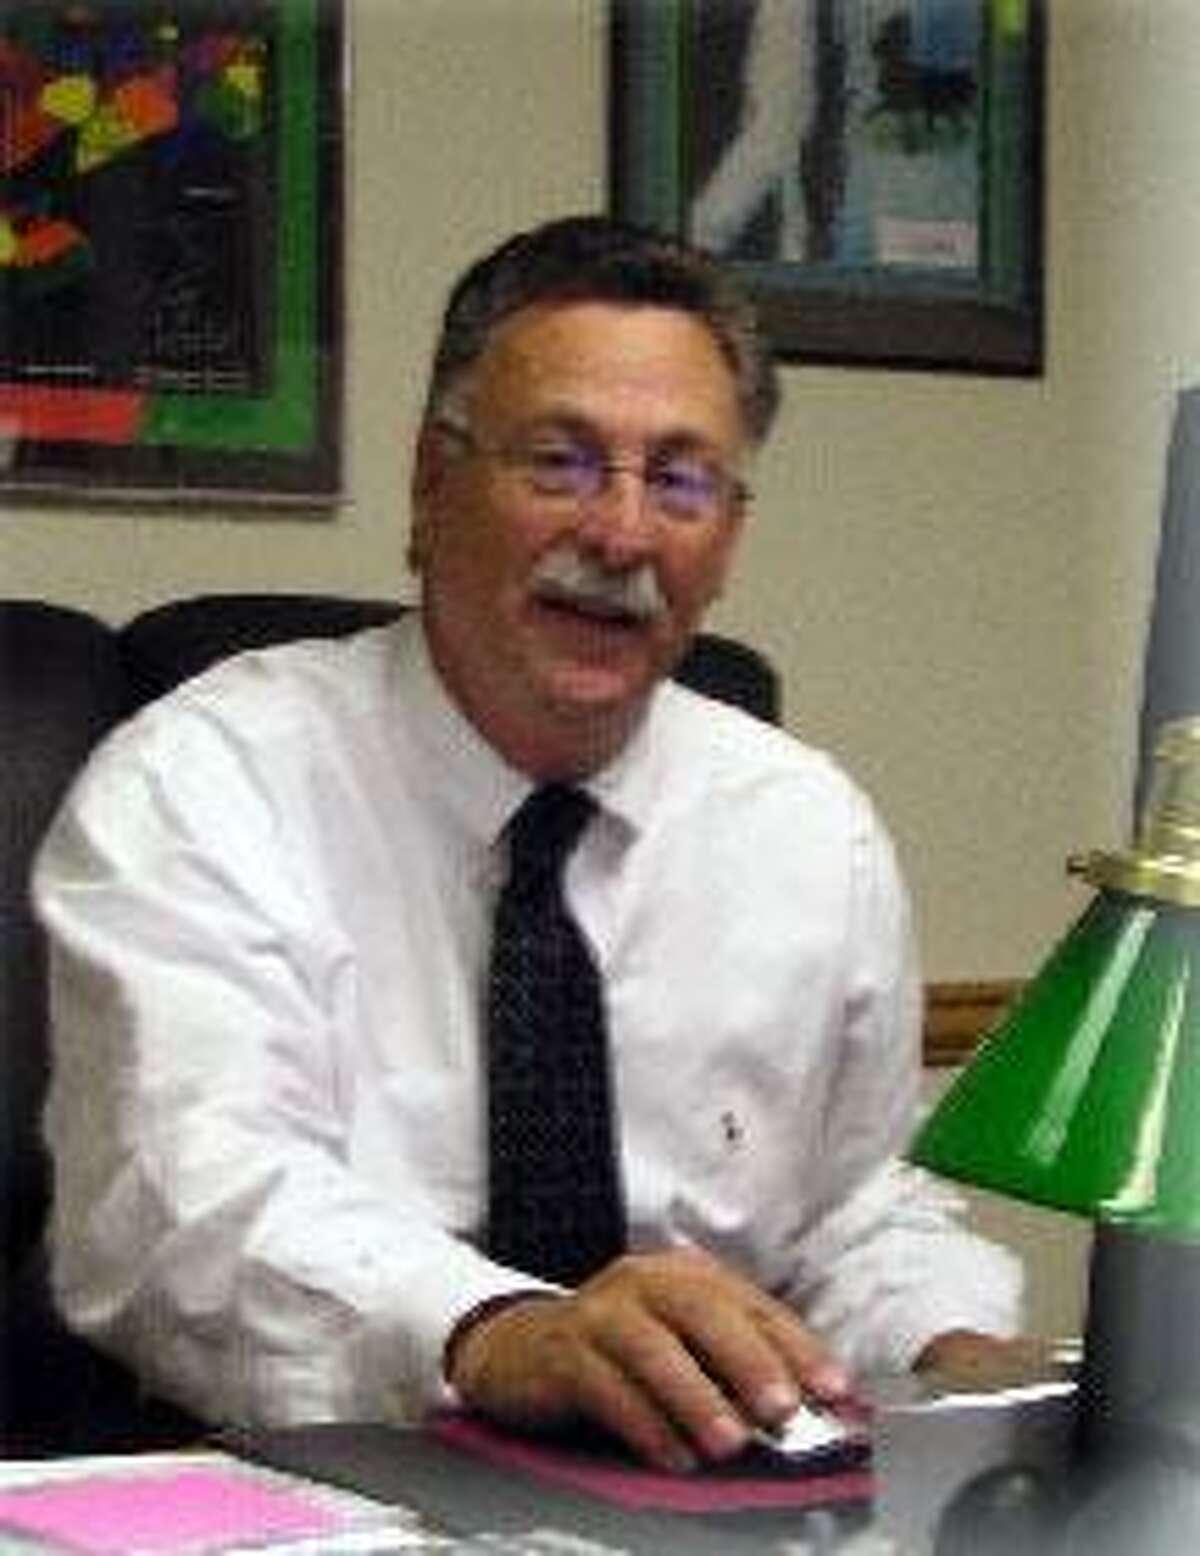 Region 10 Superintendent of Schools Alan Beitman. School district photo.